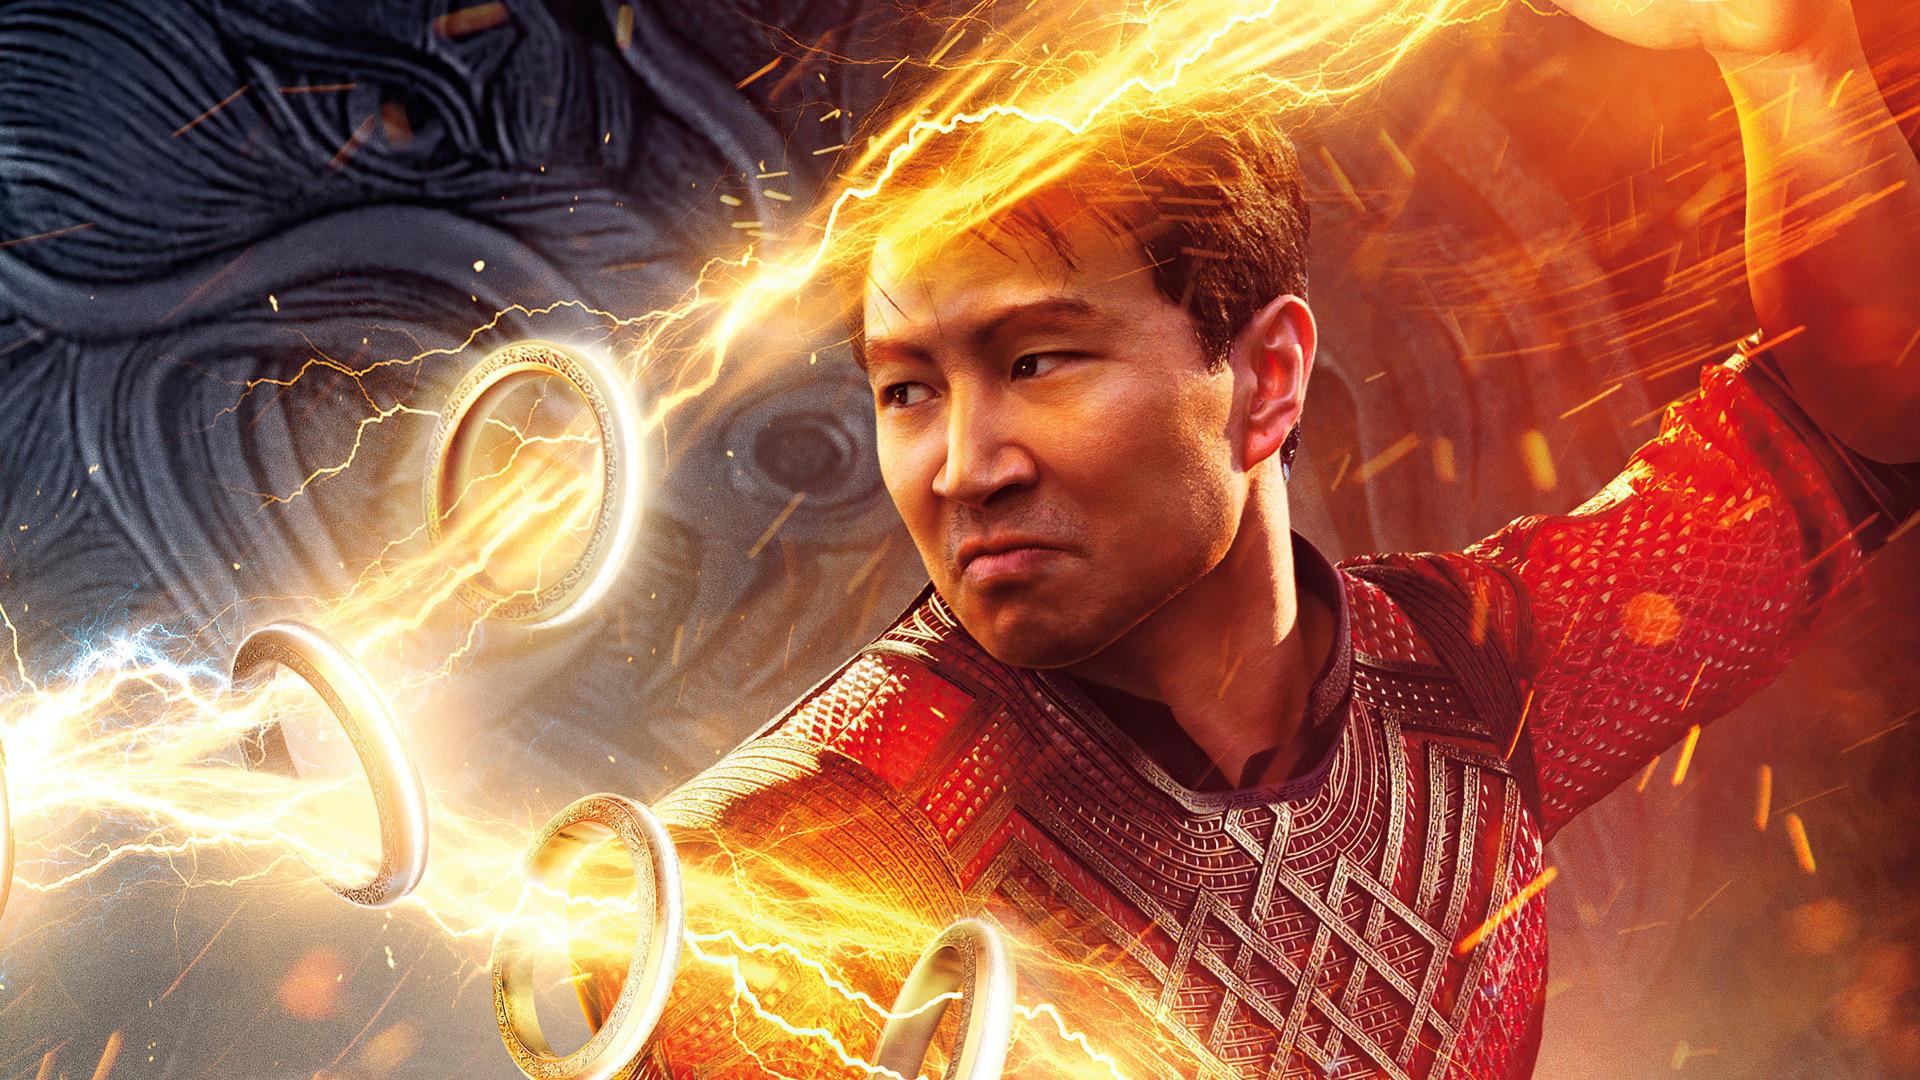 Potitulkové scény Shang-Chi vysvetlené